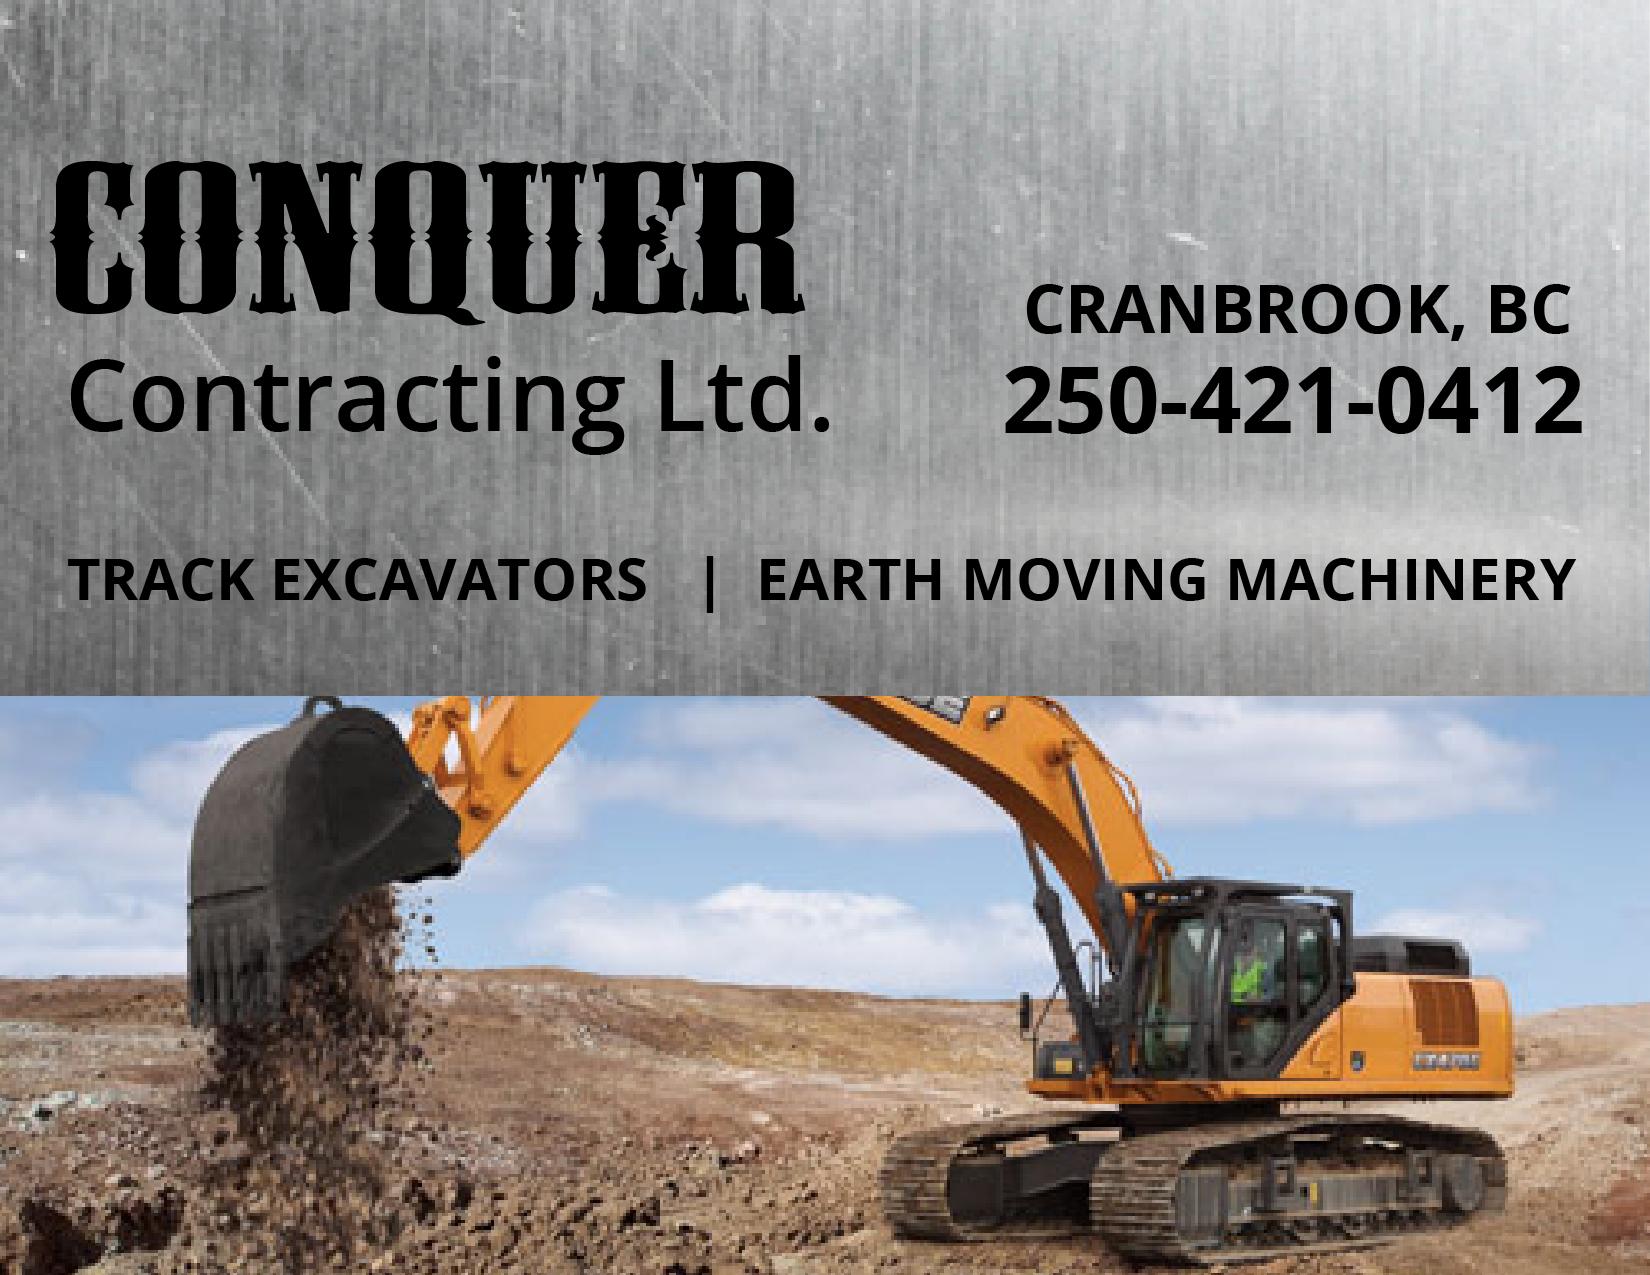 Conquer Contracting Ltd.